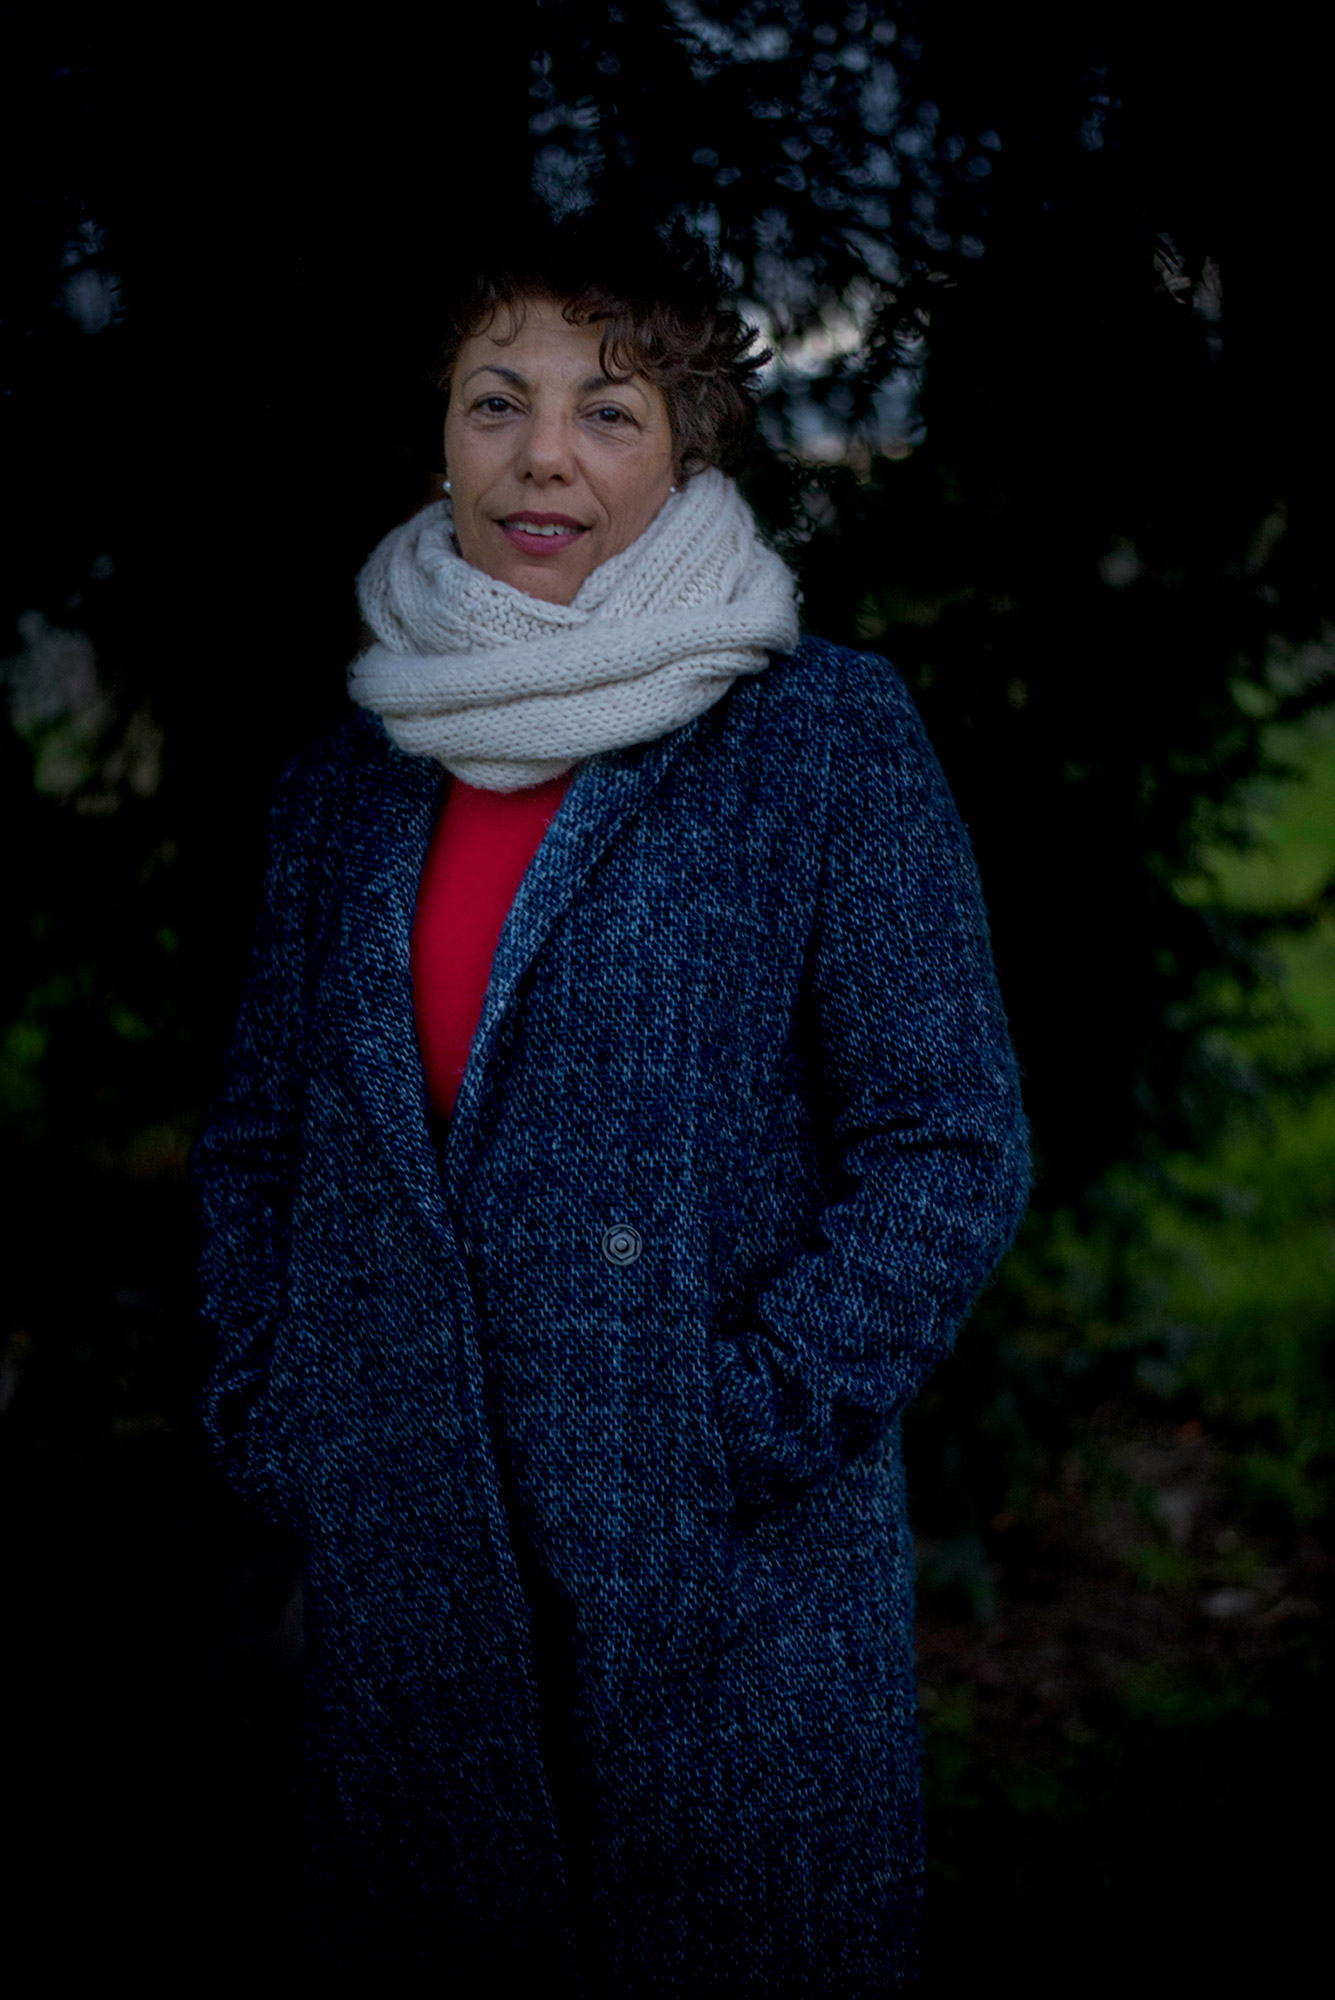 Malika Bellaribi Le Moal. Cantatrice